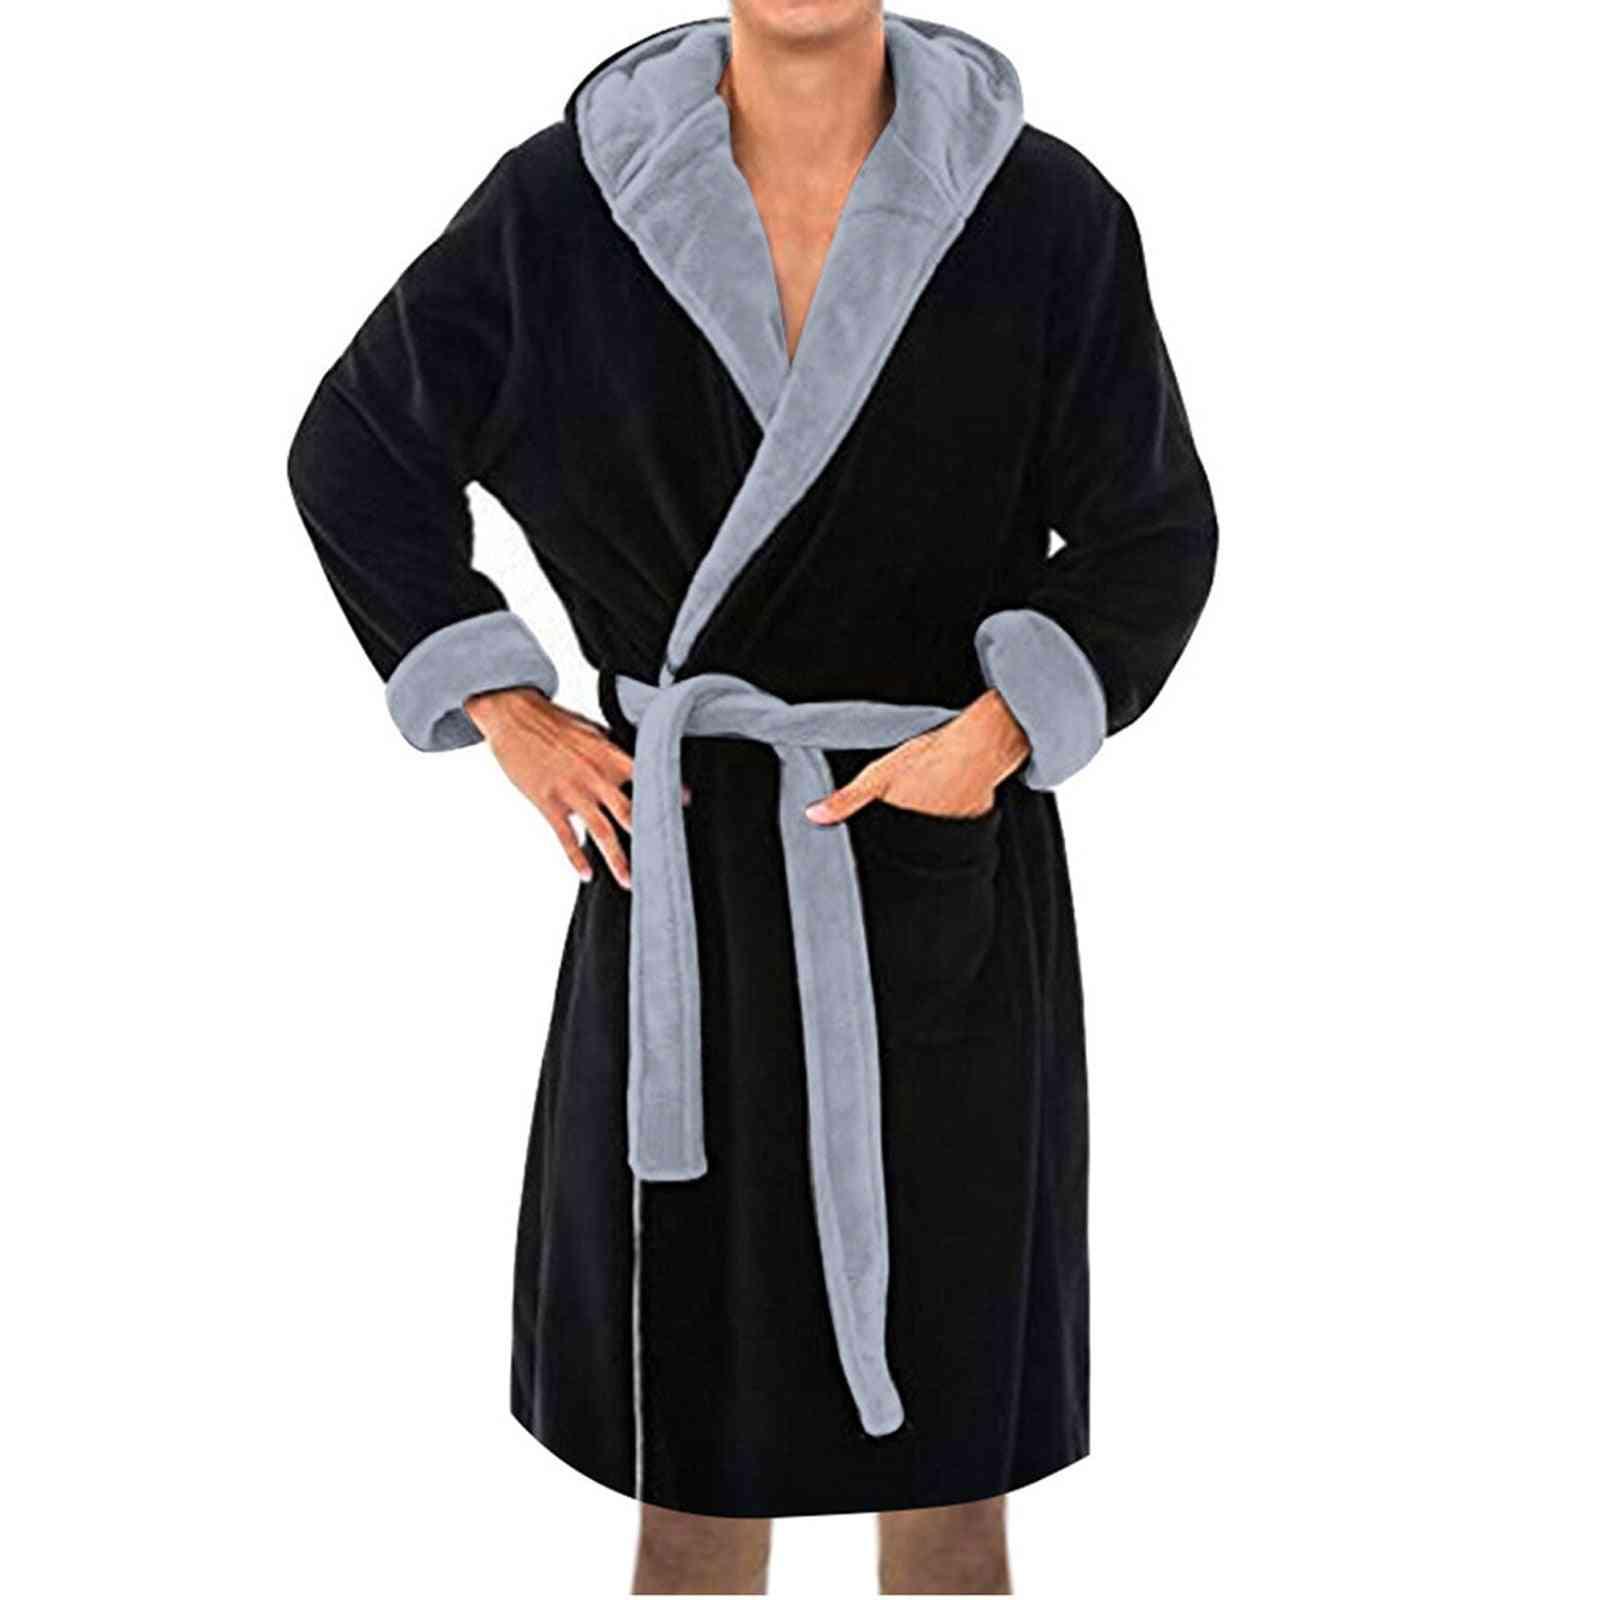 Bathrobe Winter Plush Lengthened Shawl Home Clothes Long Sleeved Coat Peignoir Femme